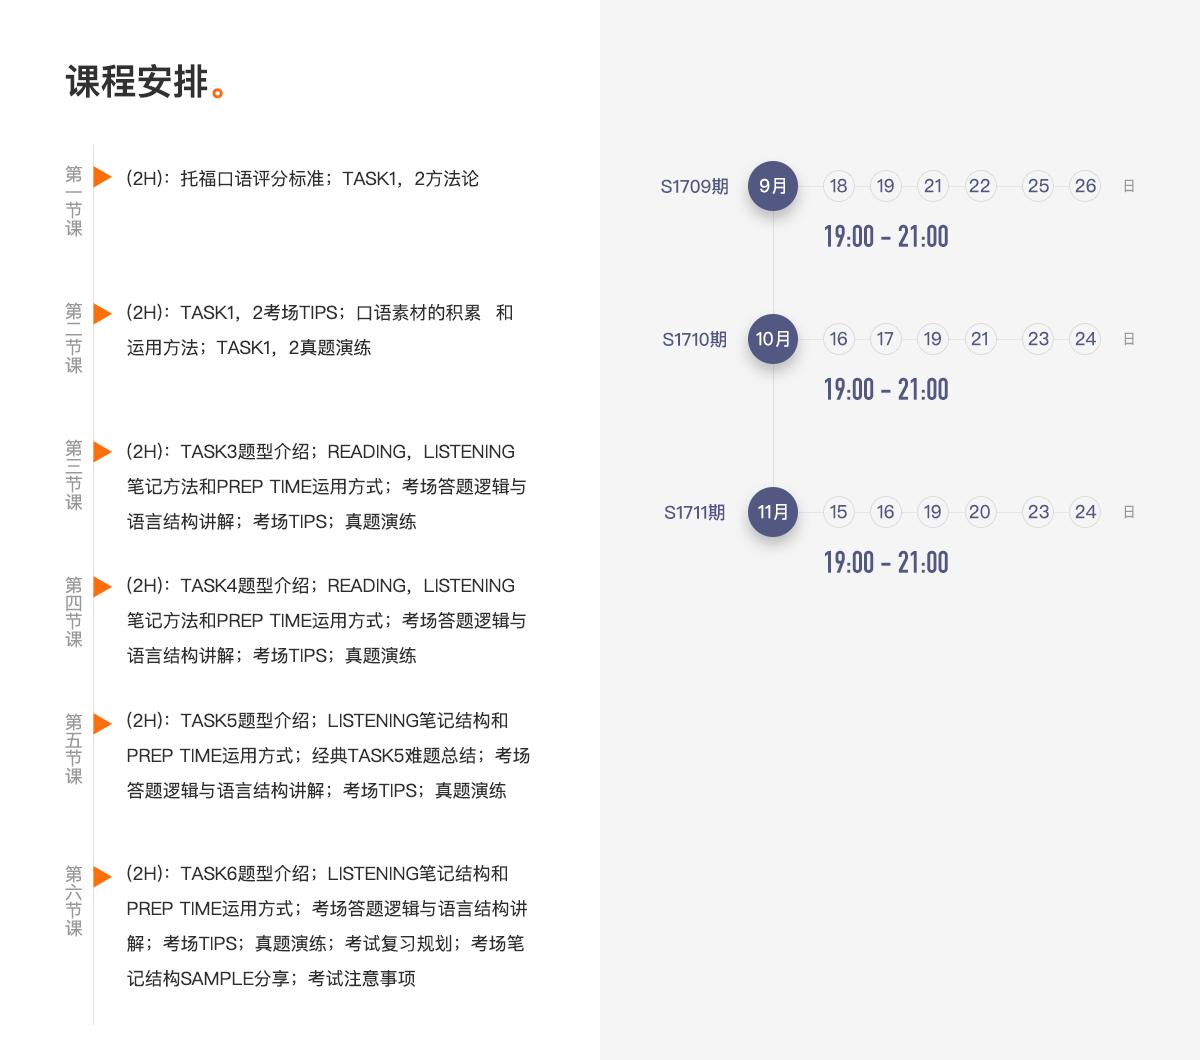 JOJO口语真题高分班_课程表.png